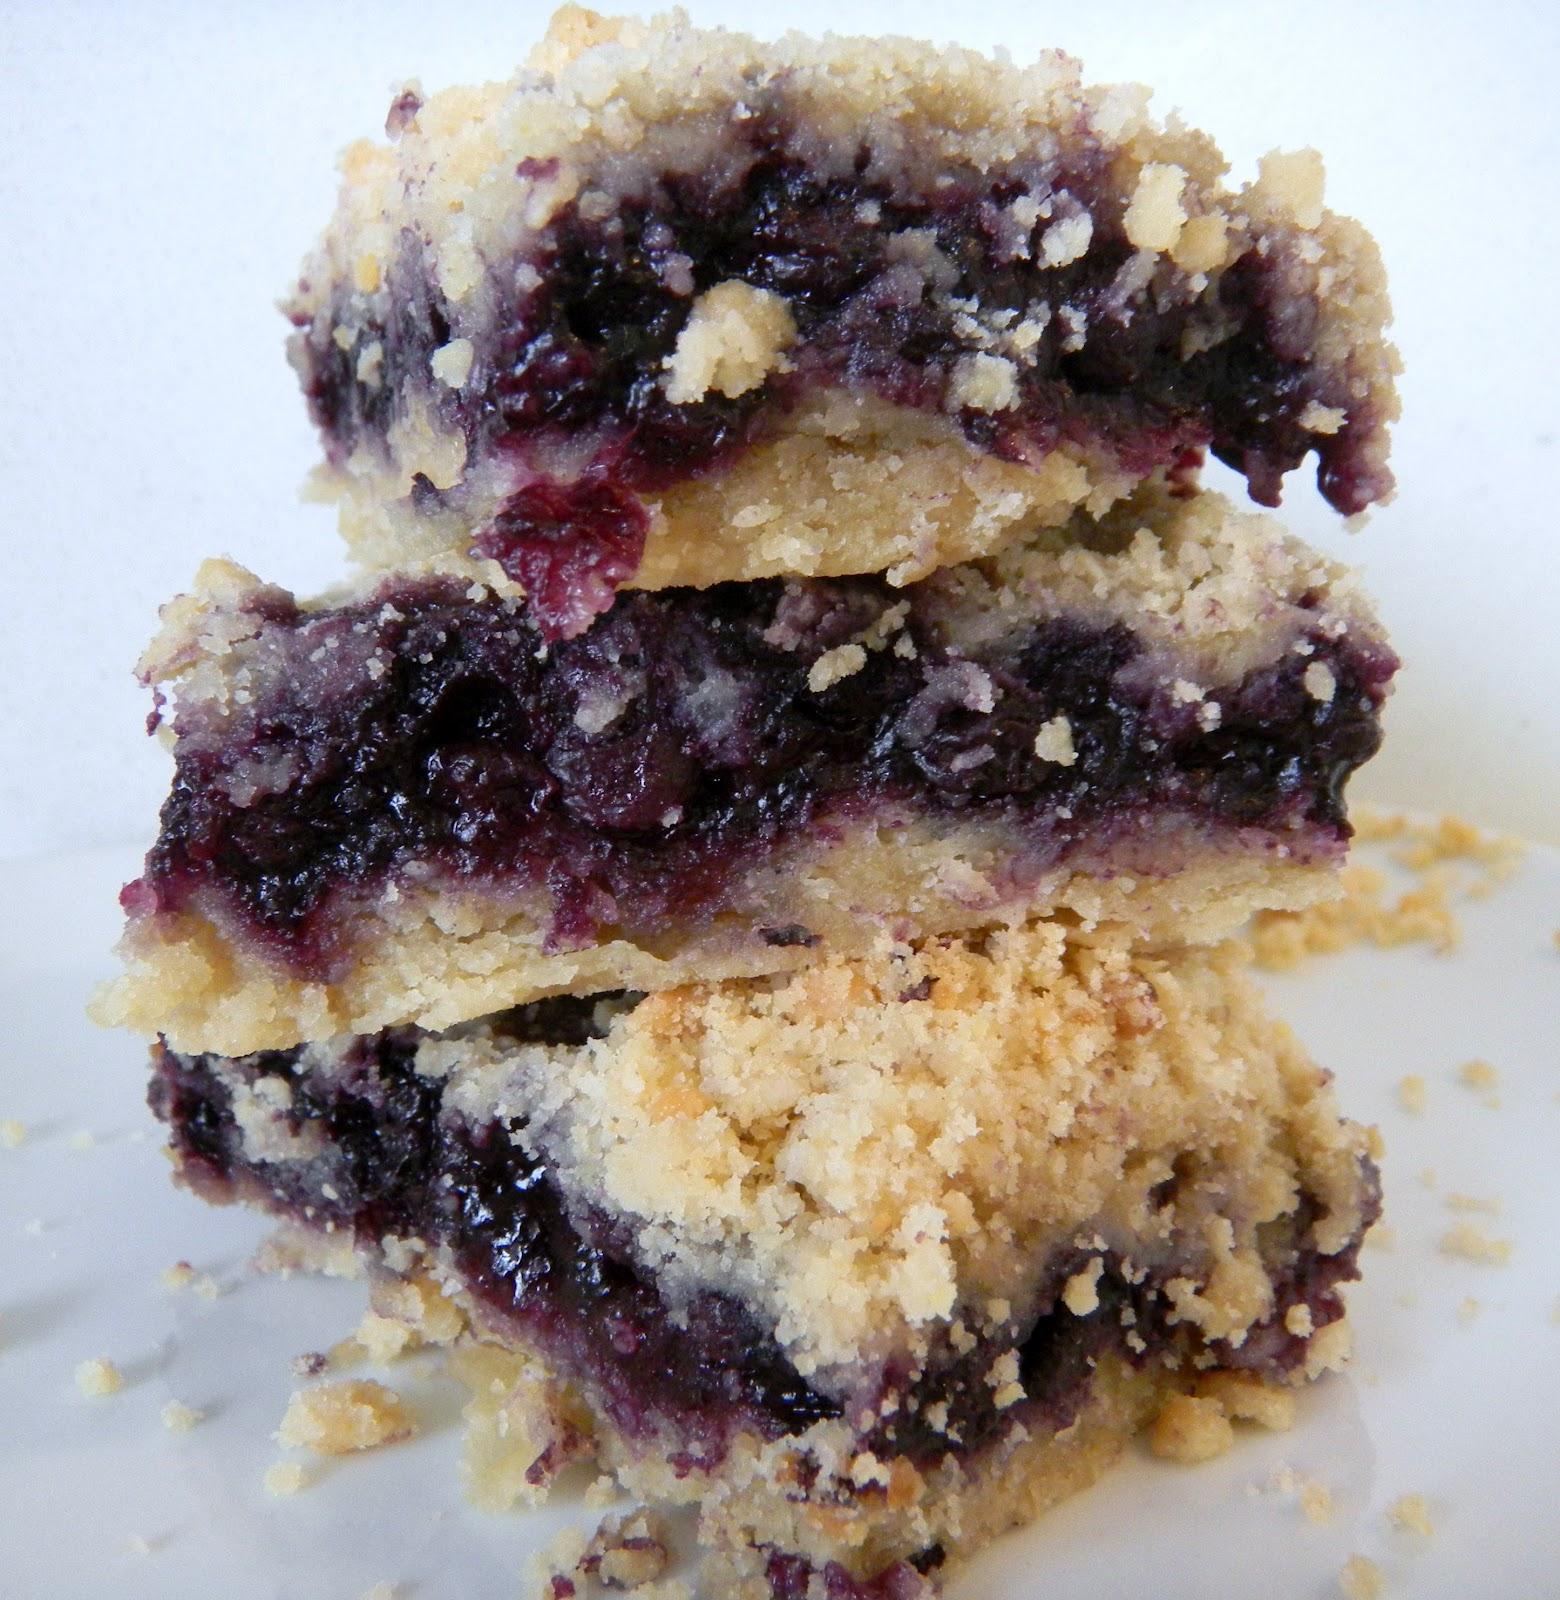 Blueberry crumb bars - Cherry on my Sundae